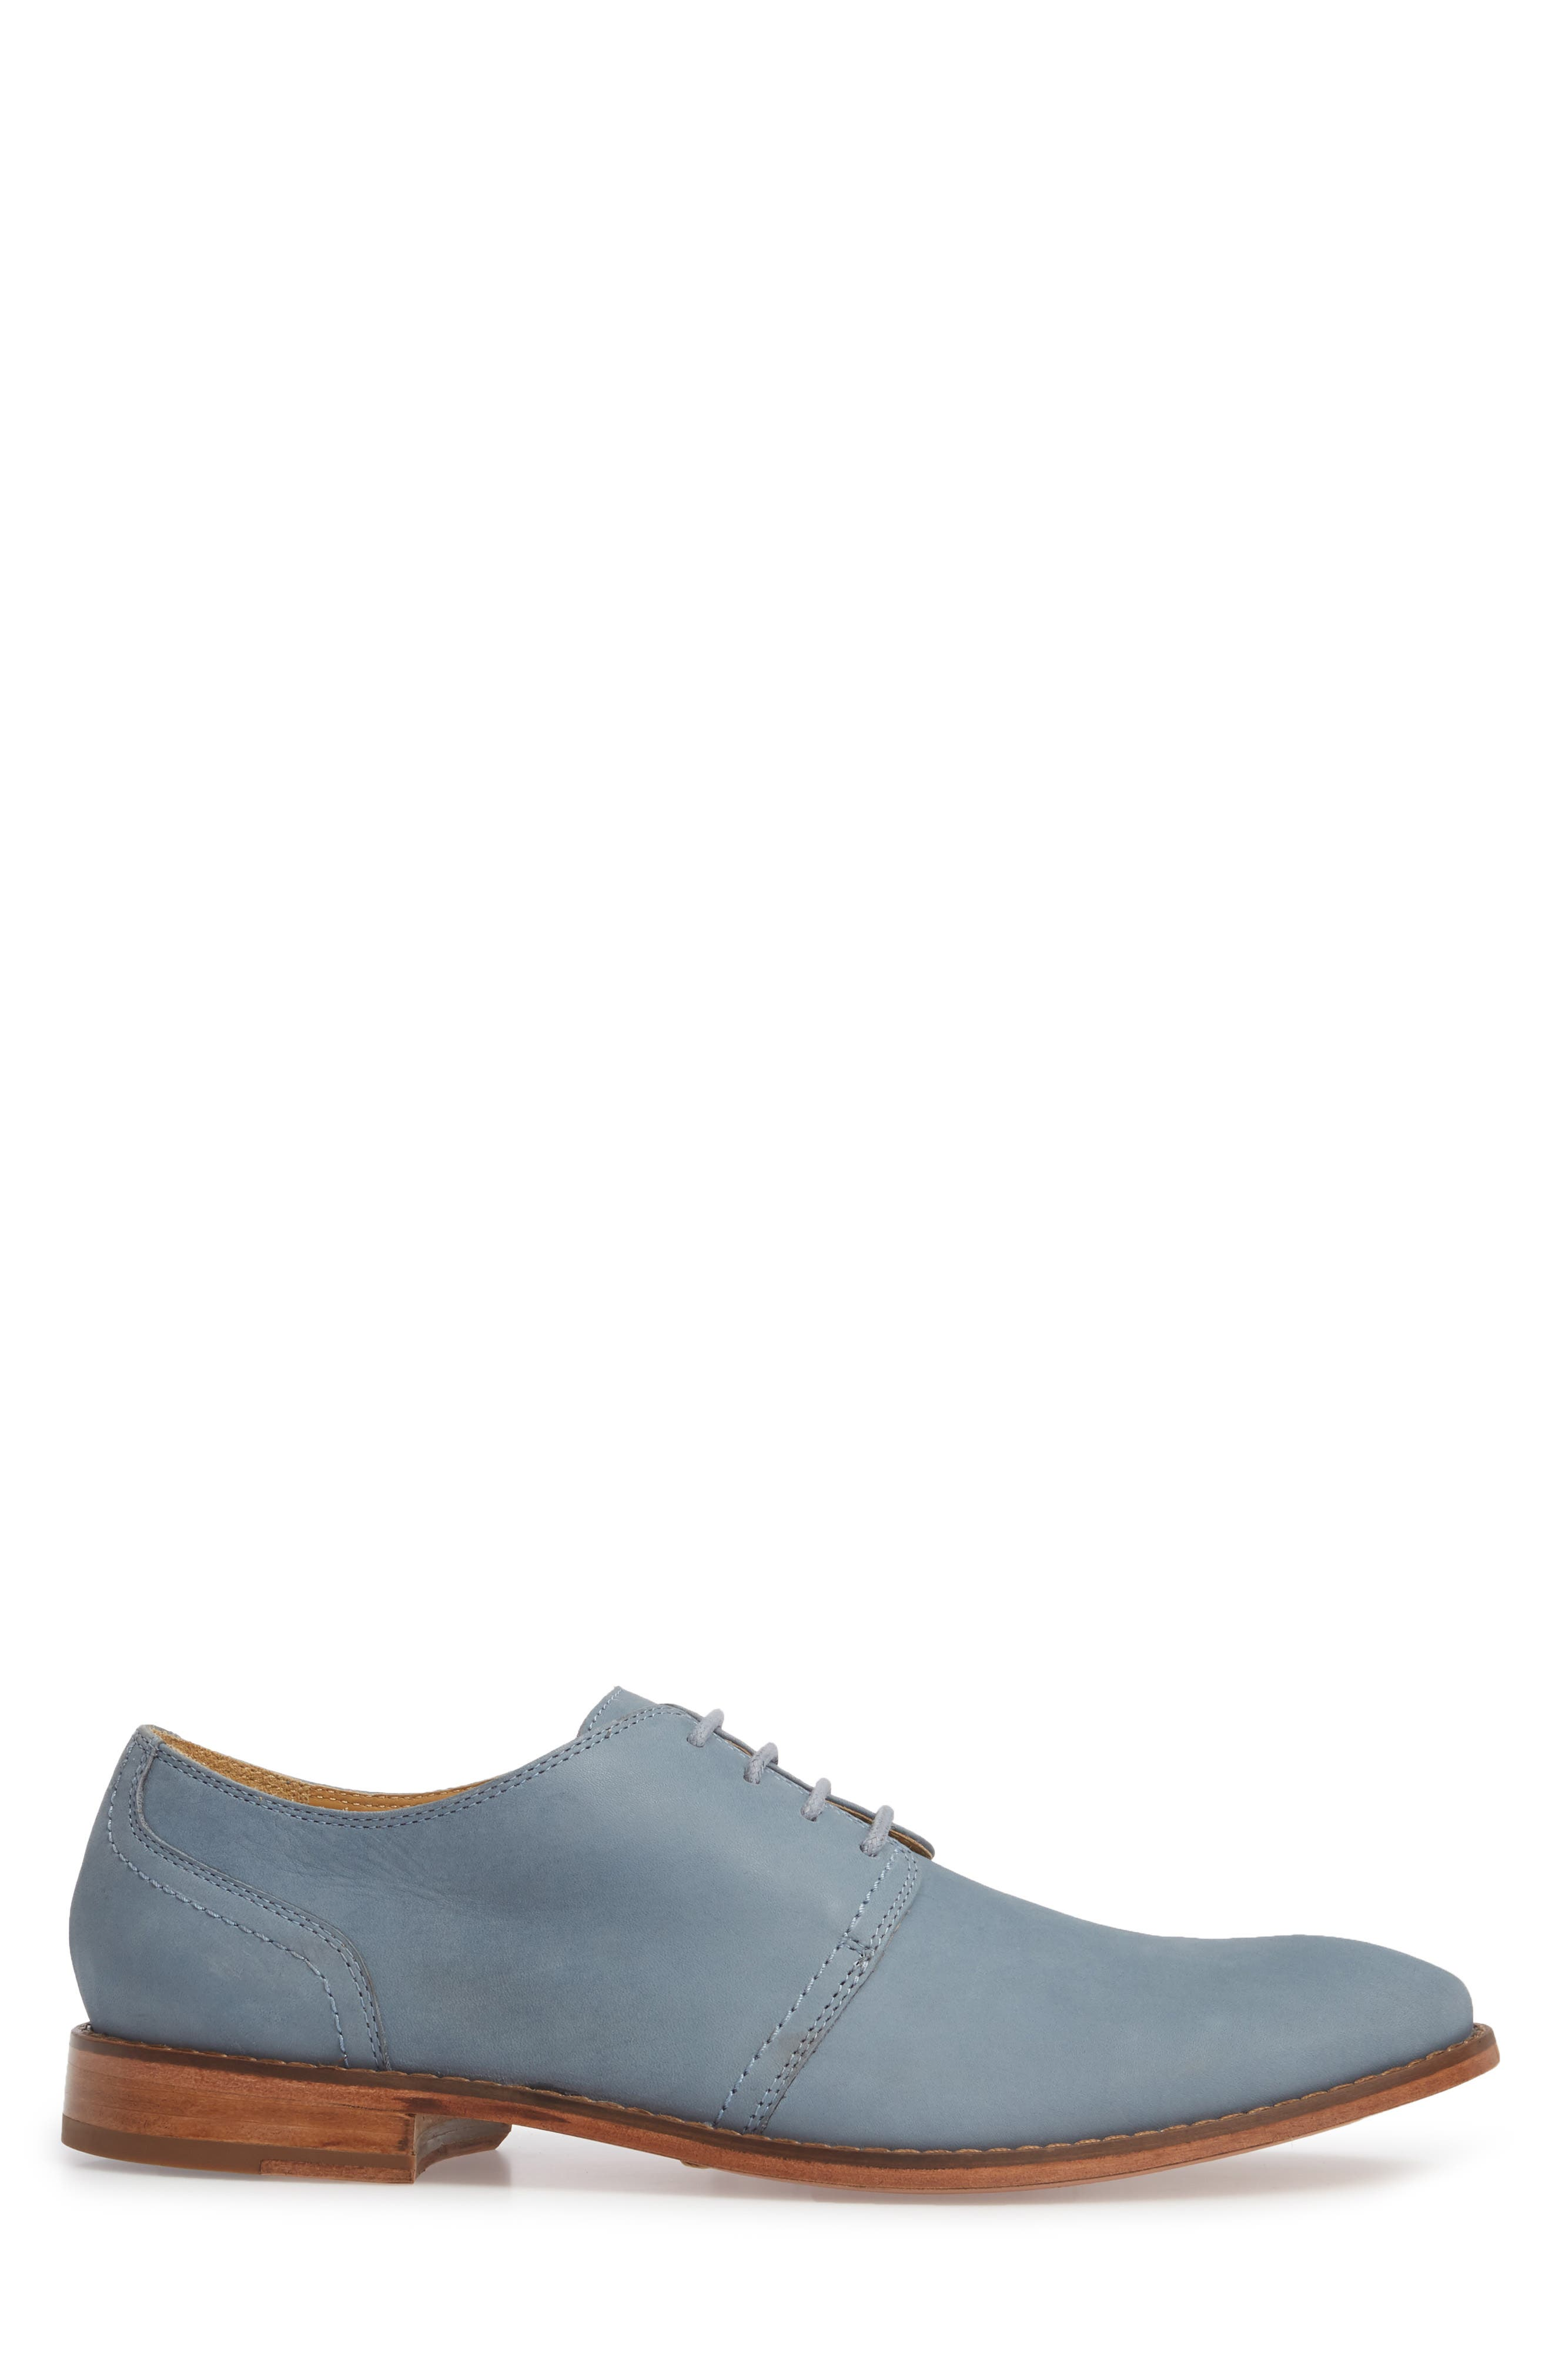 Caan Plain Toe Derby,                             Alternate thumbnail 3, color,                             Flint Stone Leather